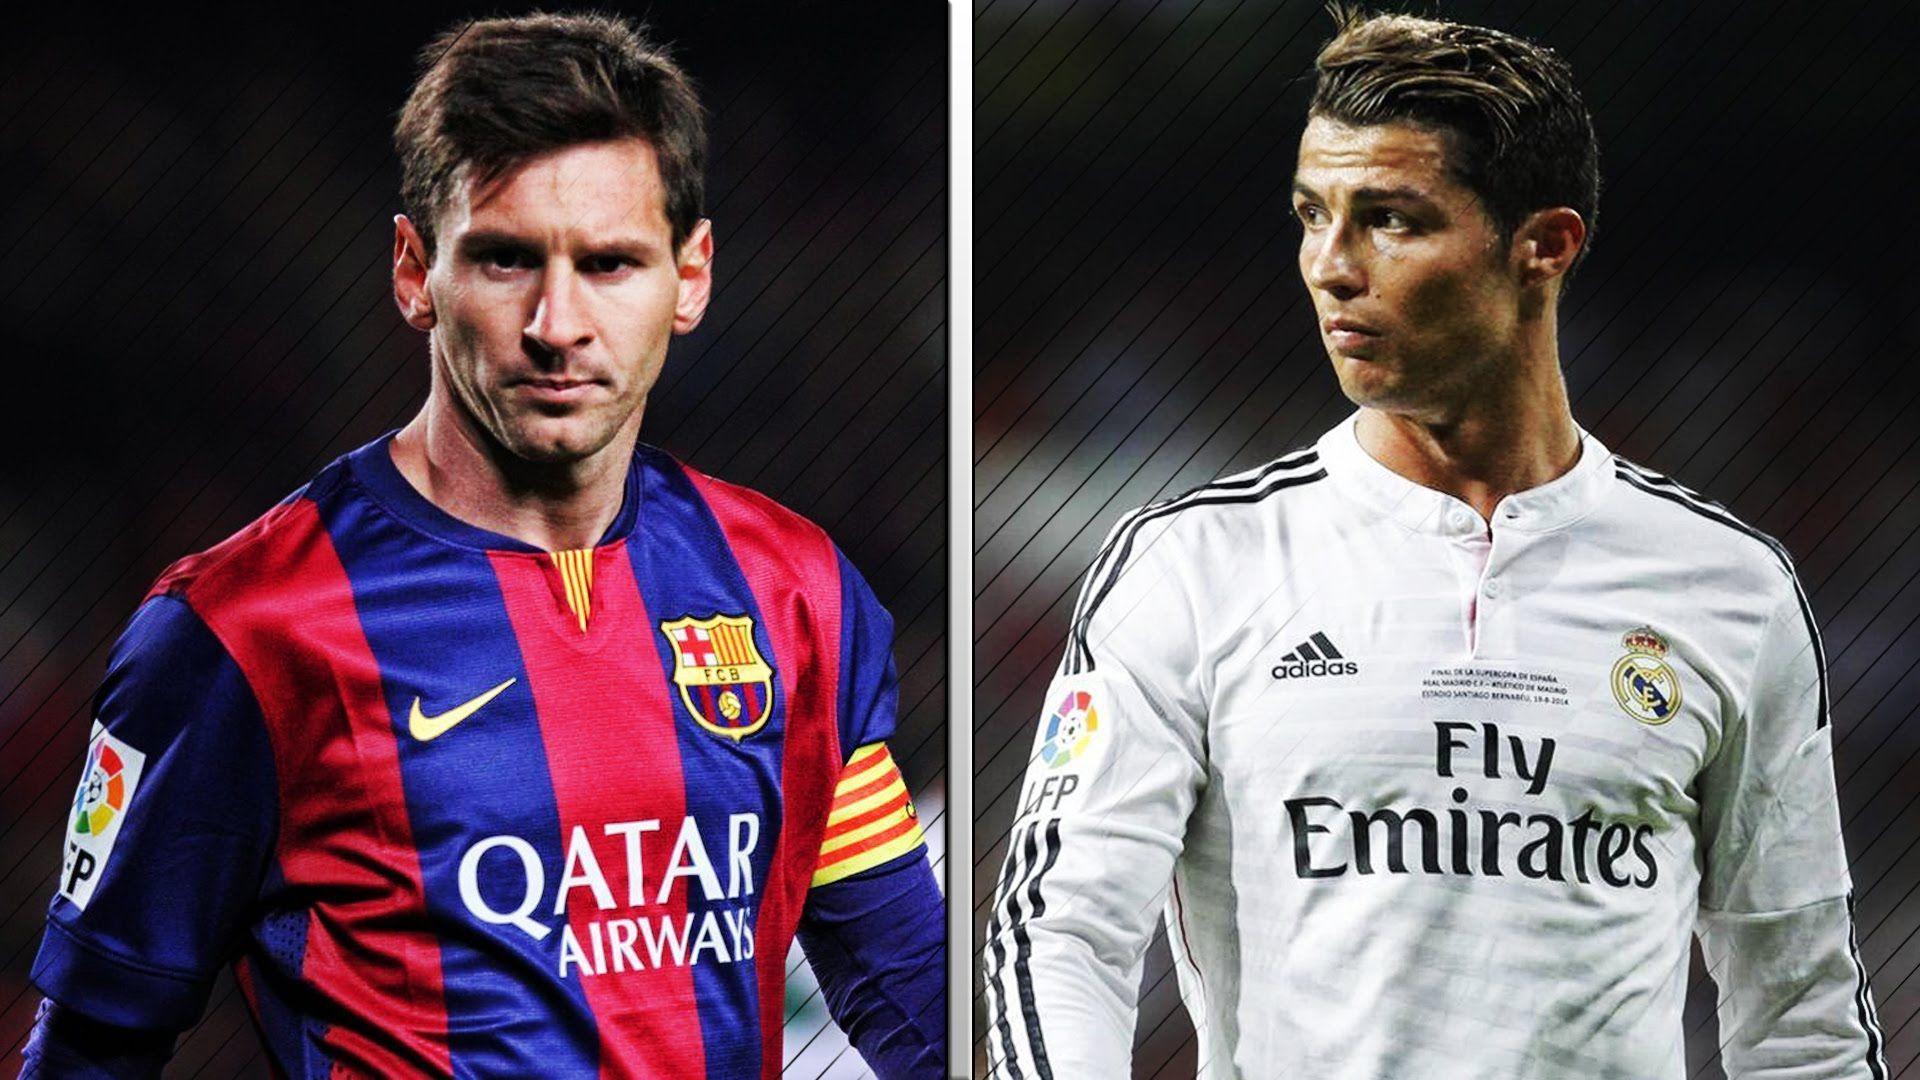 Messi Vs Ronaldo Wallpapers 2016 HD - Wallpaper Cave